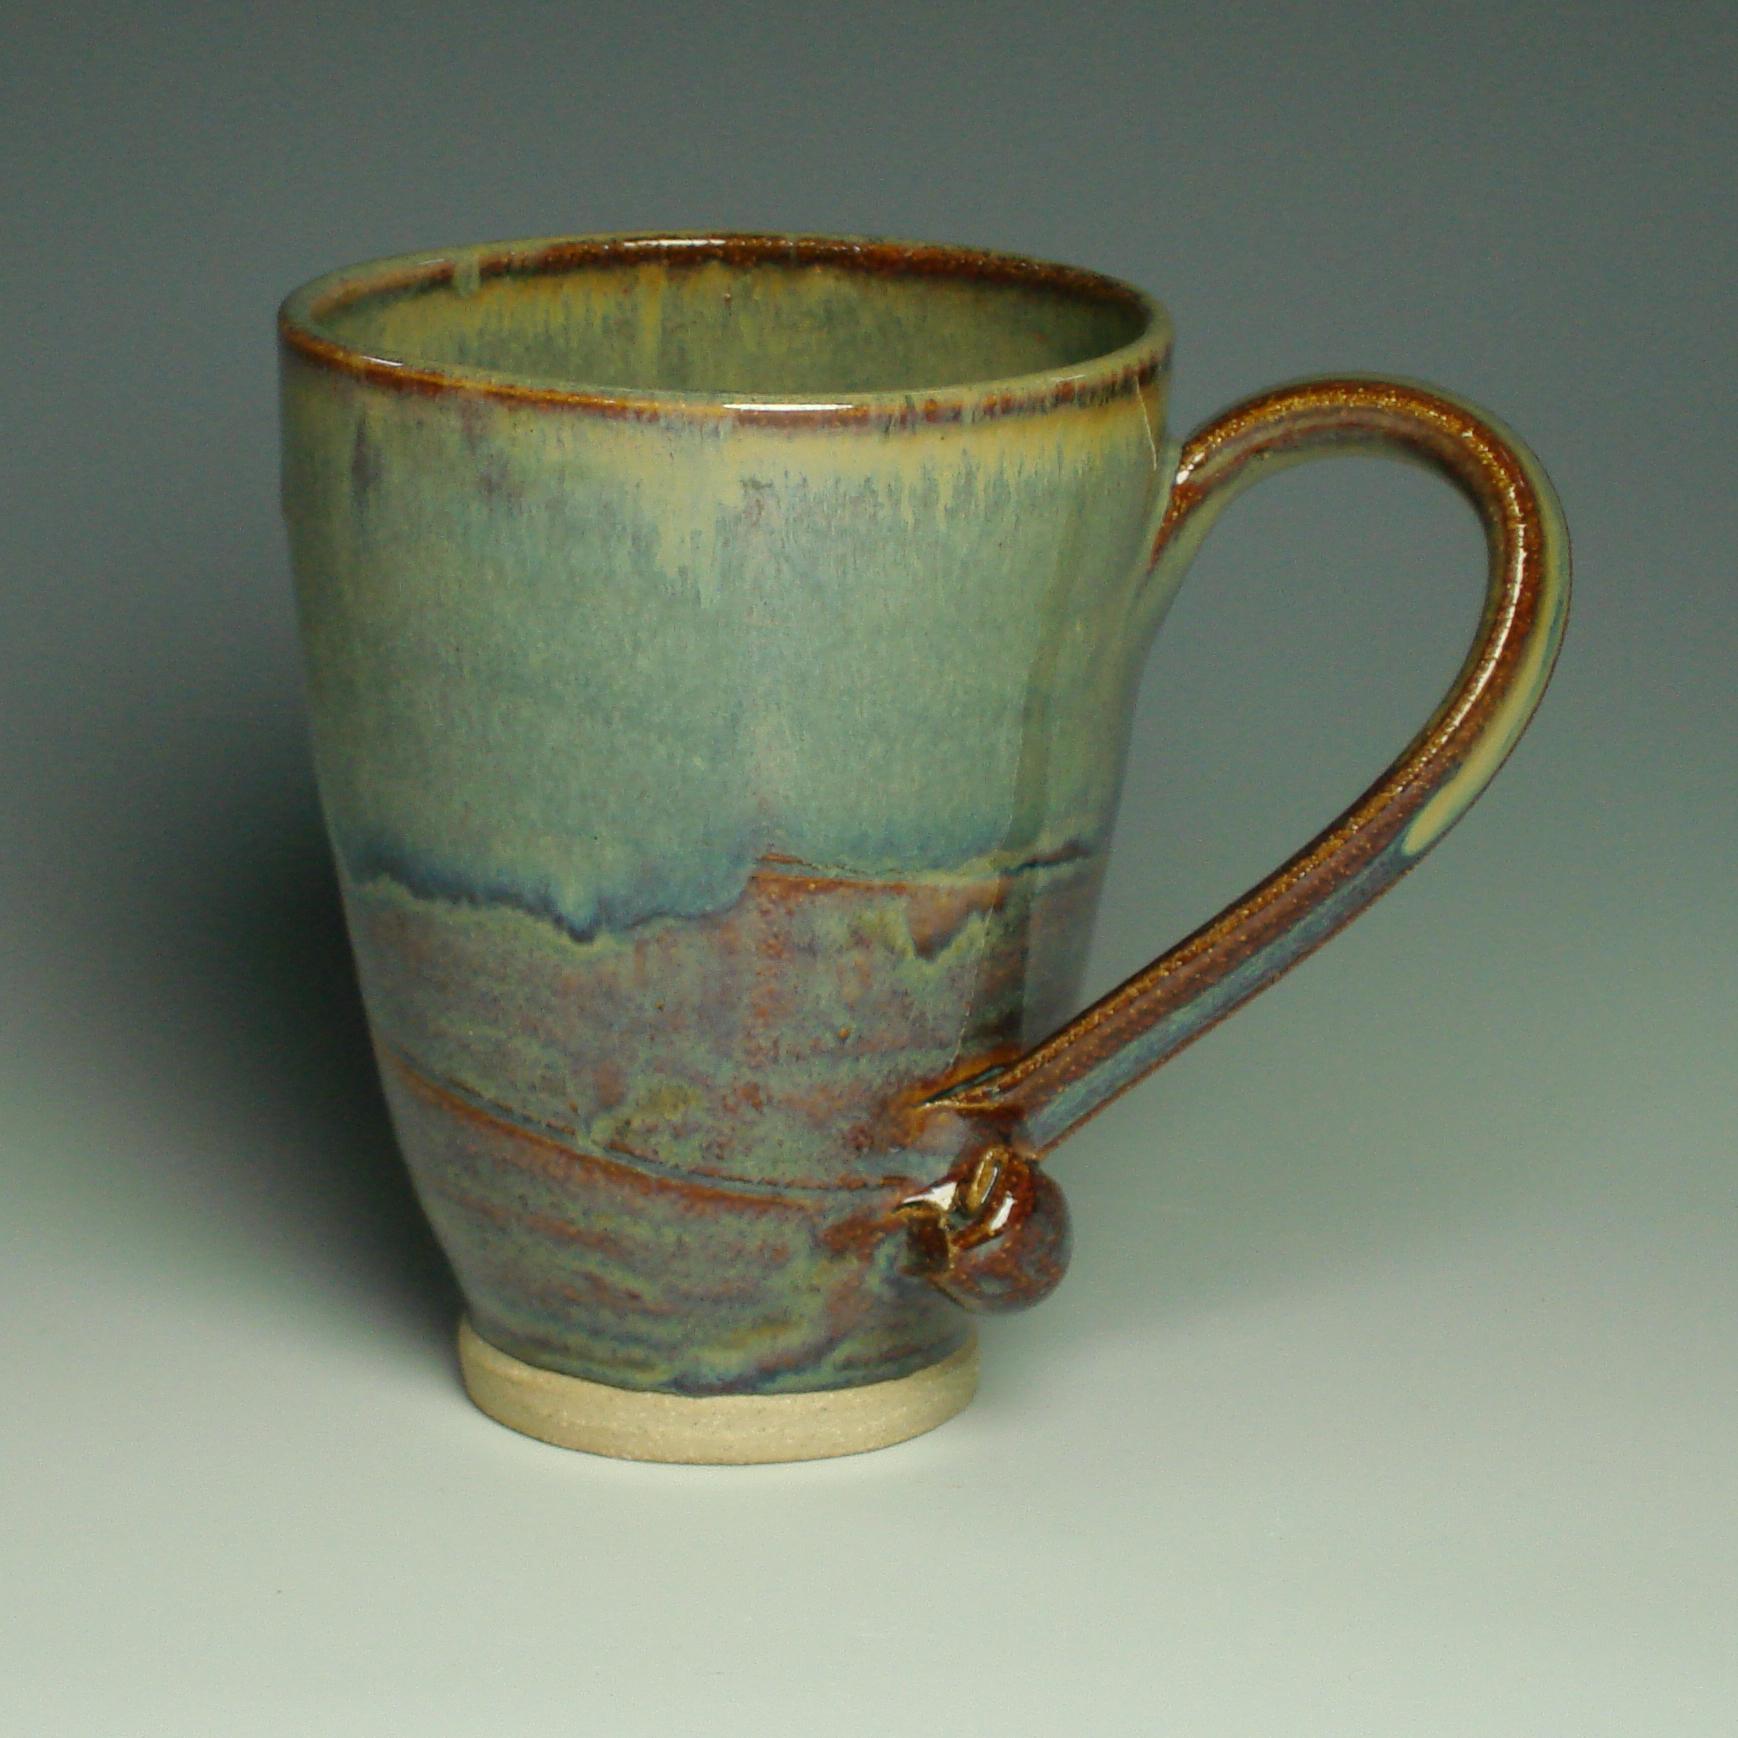 Squareware Autumn Mug